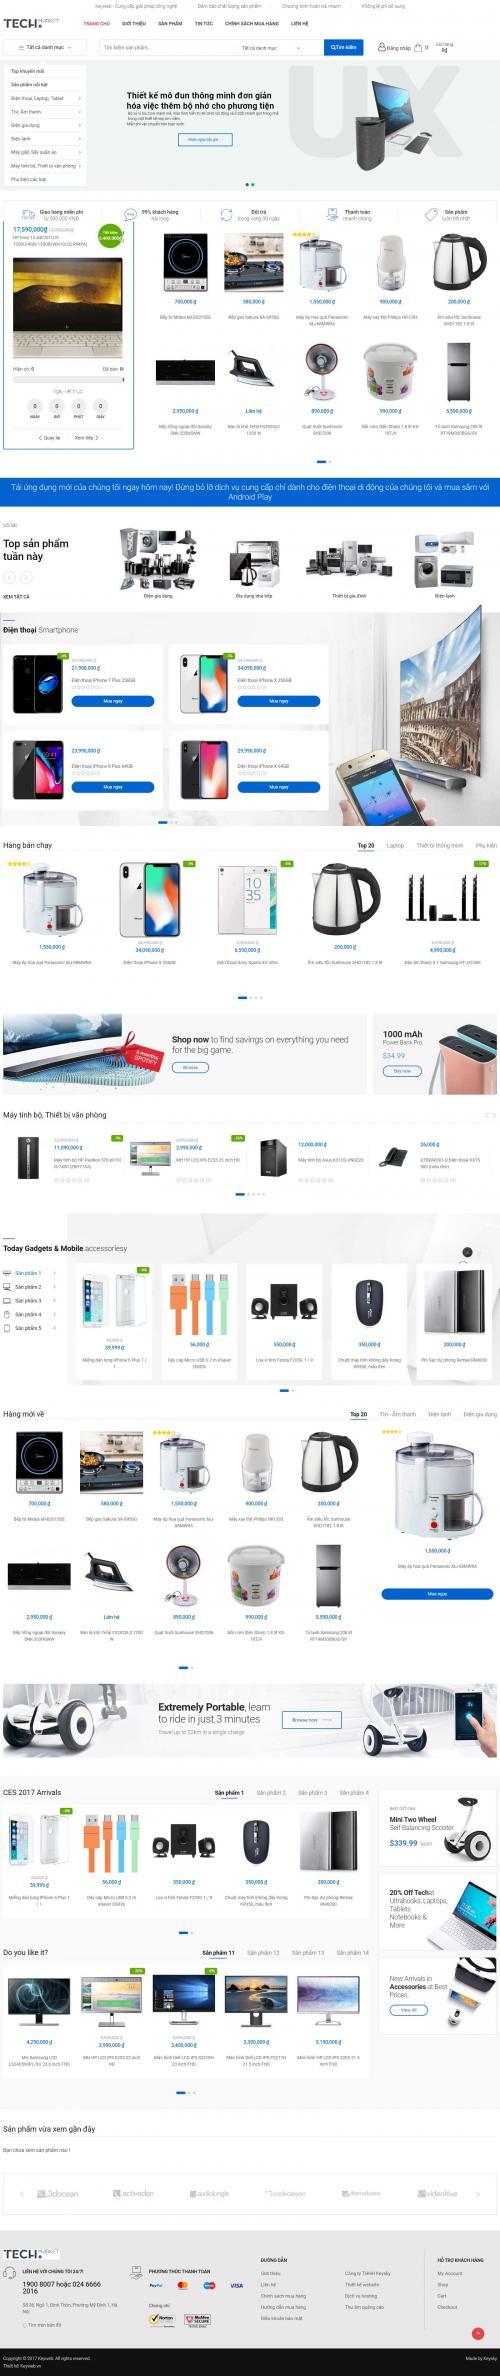 Điện tử kỹ thuật số Tech Market